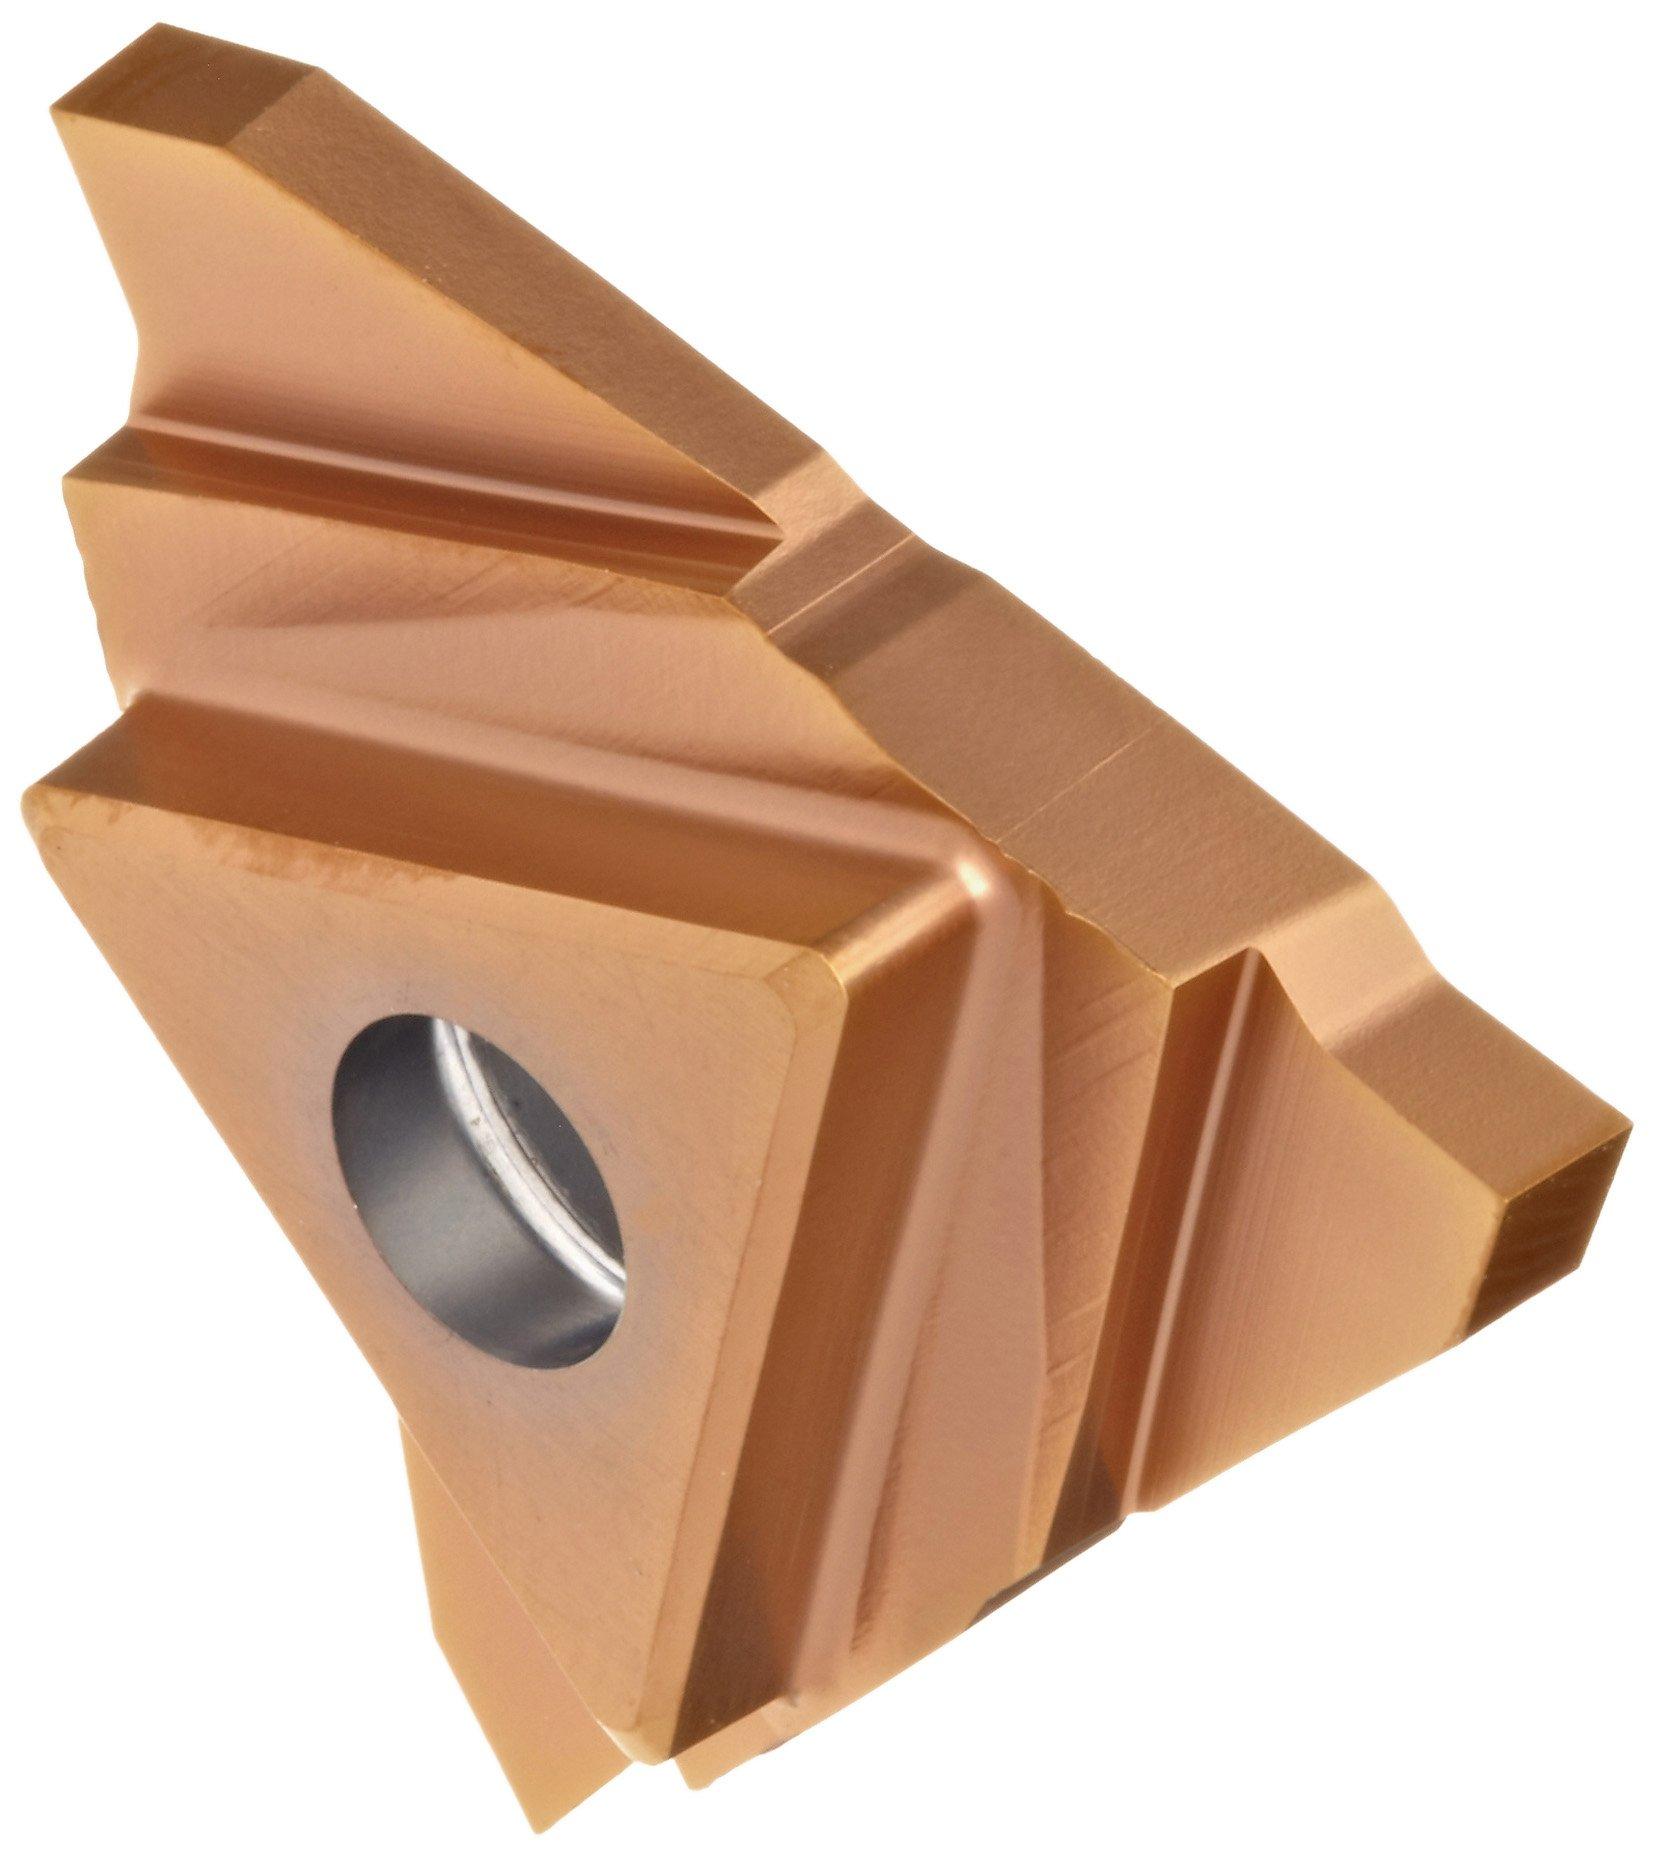 Sandvik Coromant CoroCut 3 Carbide Grooving Insert, GS Geometry, GC1125 Grade, Multi-Layer Coating, 3 Cutting Edges, N123T3-0090-0000-GS, Neutral Cut, Right-Hand Orientation,, 0.035'' Cutting Width, 0'' Corner Radius, T Insert Seat Size (Pack of 10)